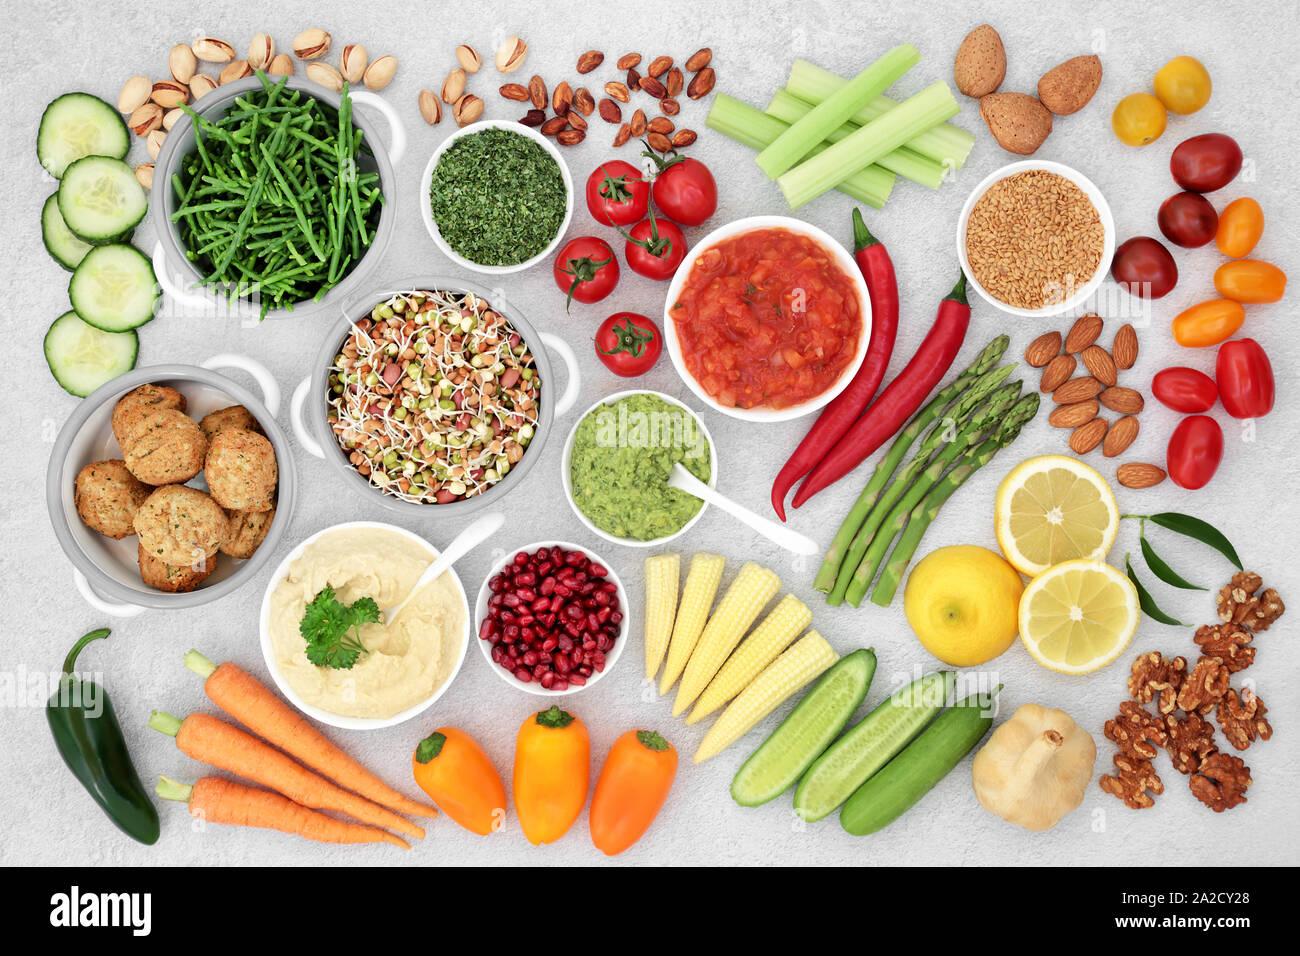 nuts for vegan diet